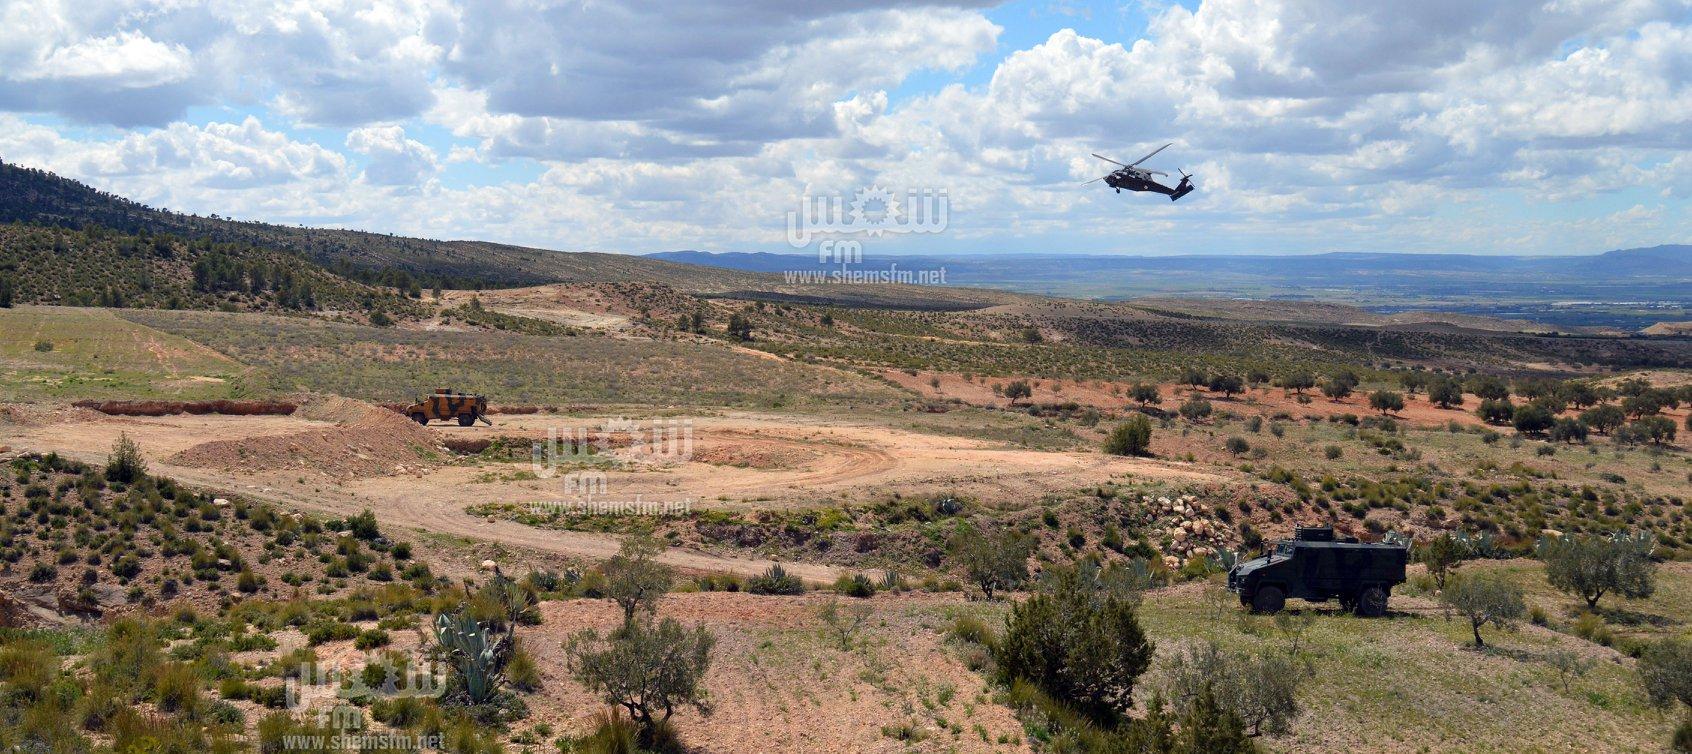 Armée Tunisienne / Tunisian Armed Forces / القوات المسلحة التونسية - Page 16 57085289-2444554978899106-1186259375765848064-o